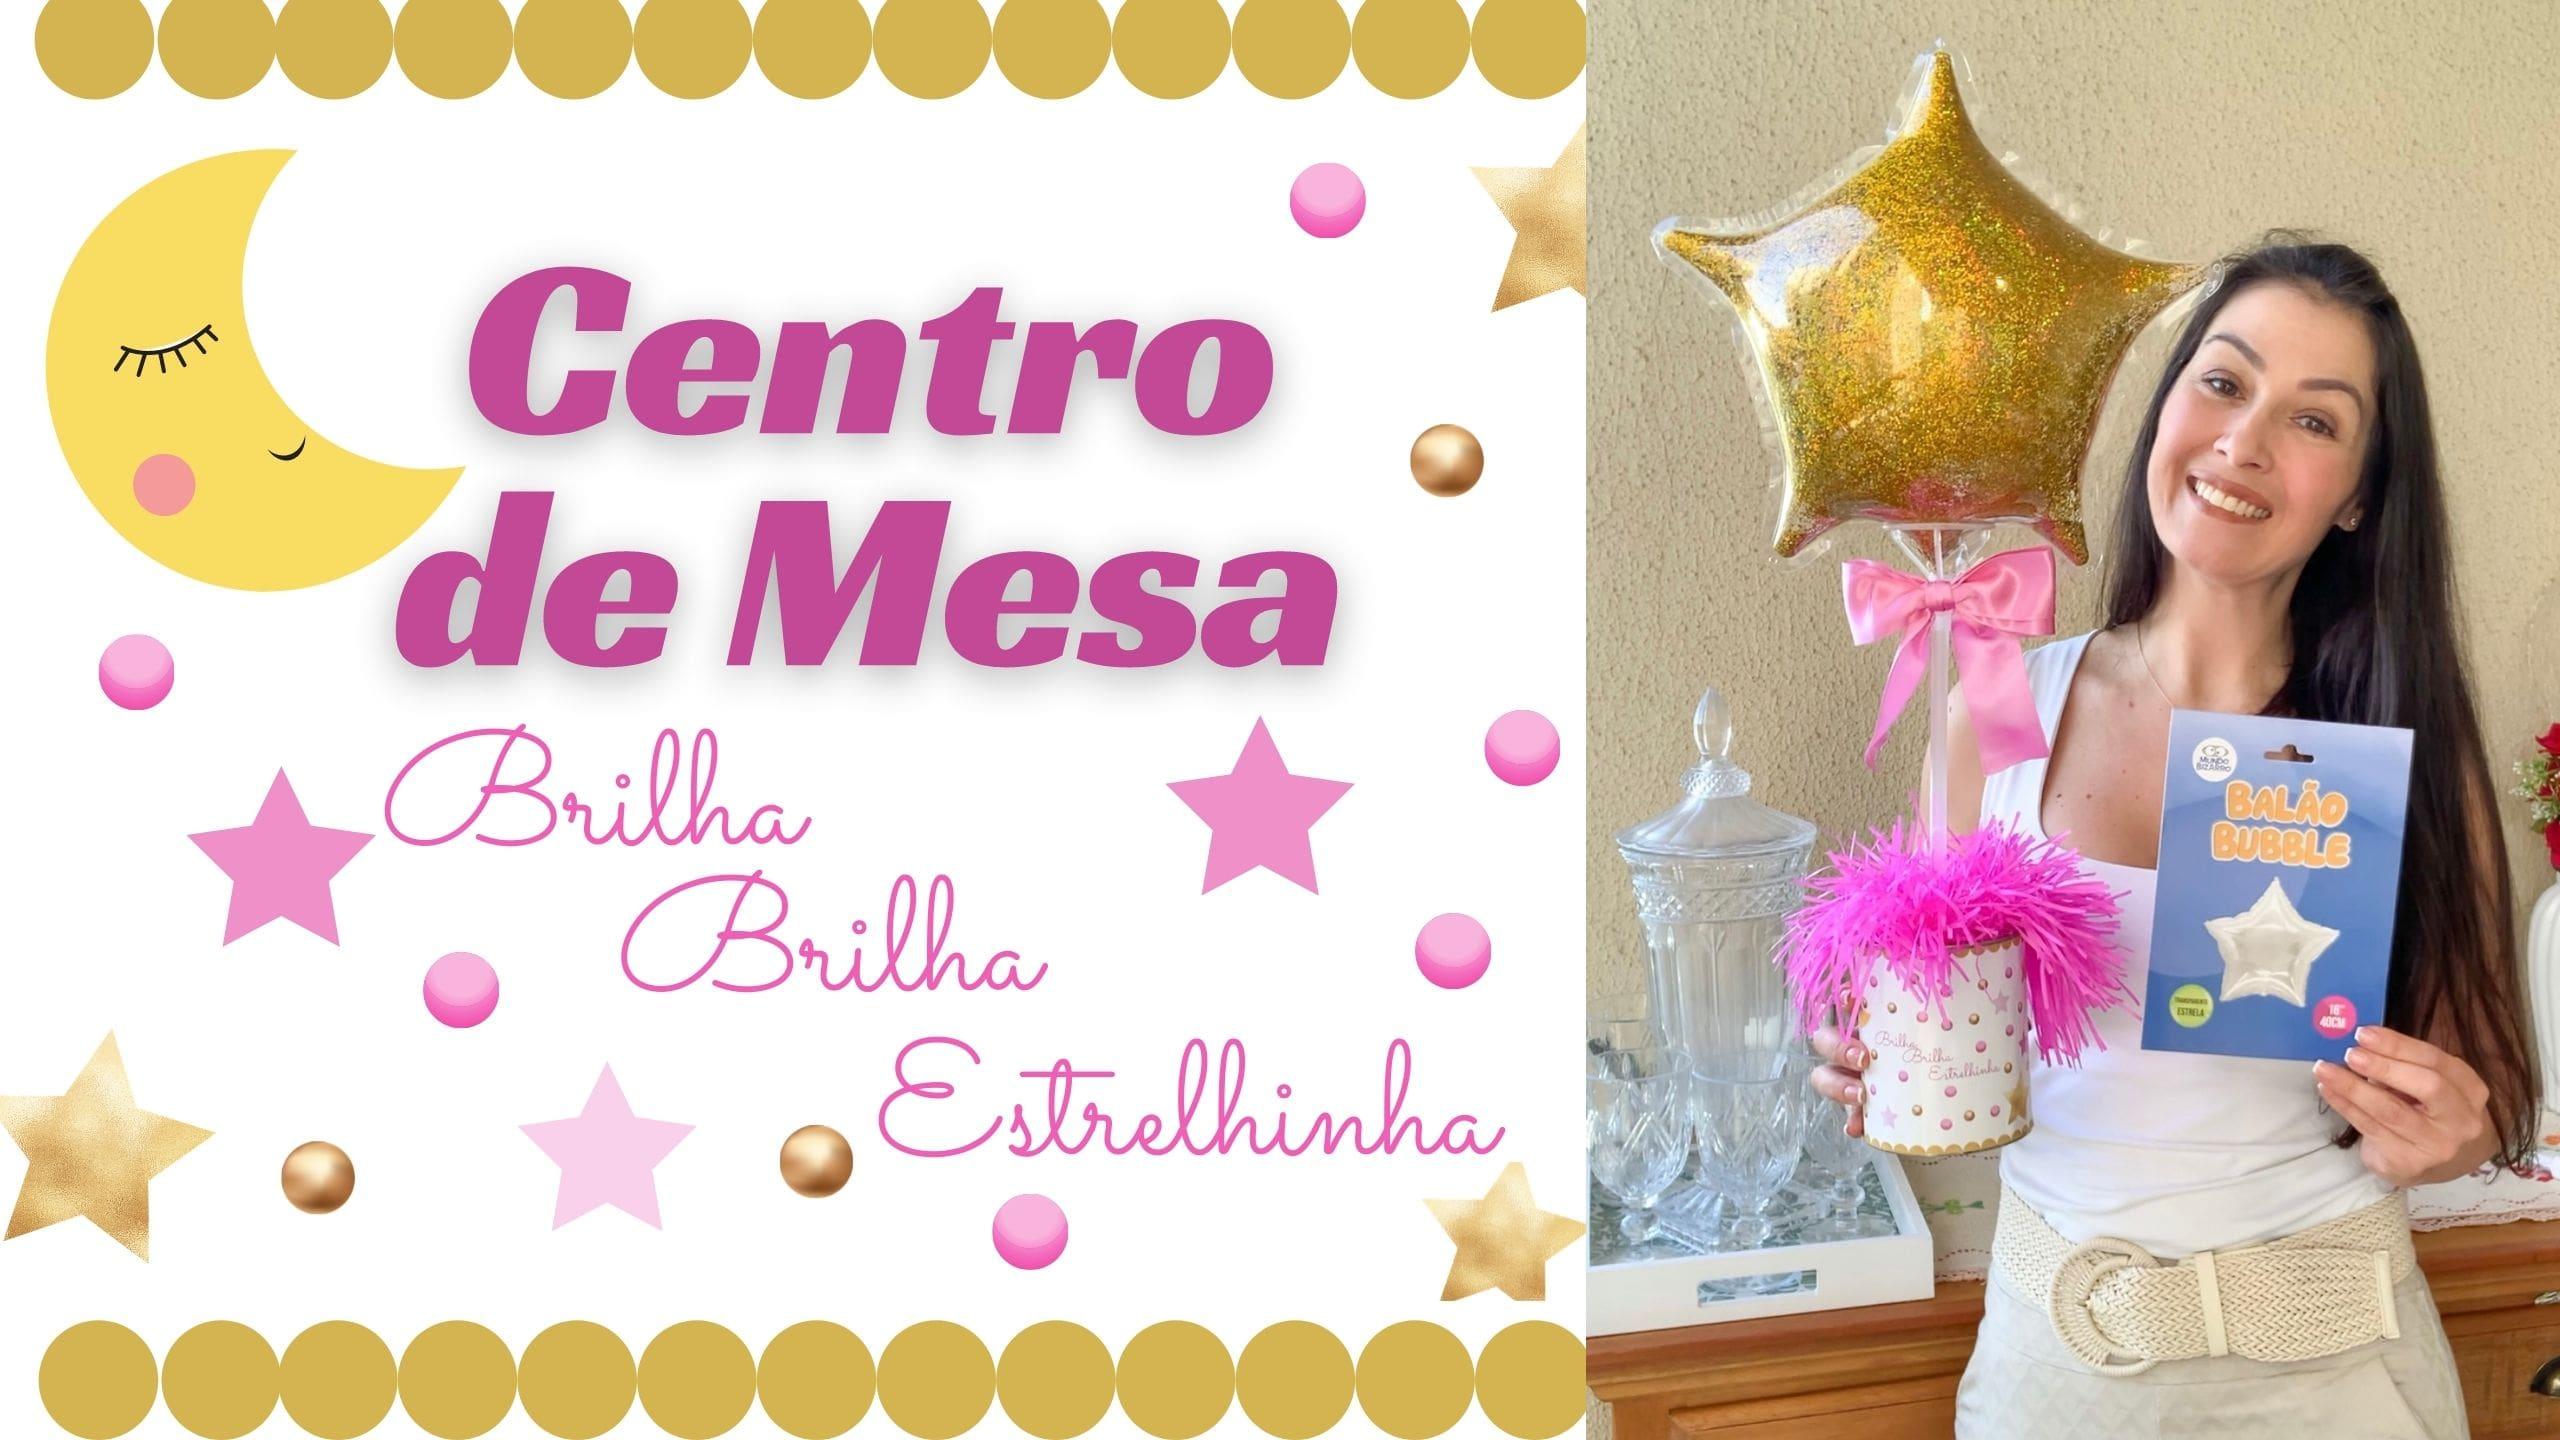 Centro de Mesa Brilha Brilha Estrelinha – Lata de leite decorada